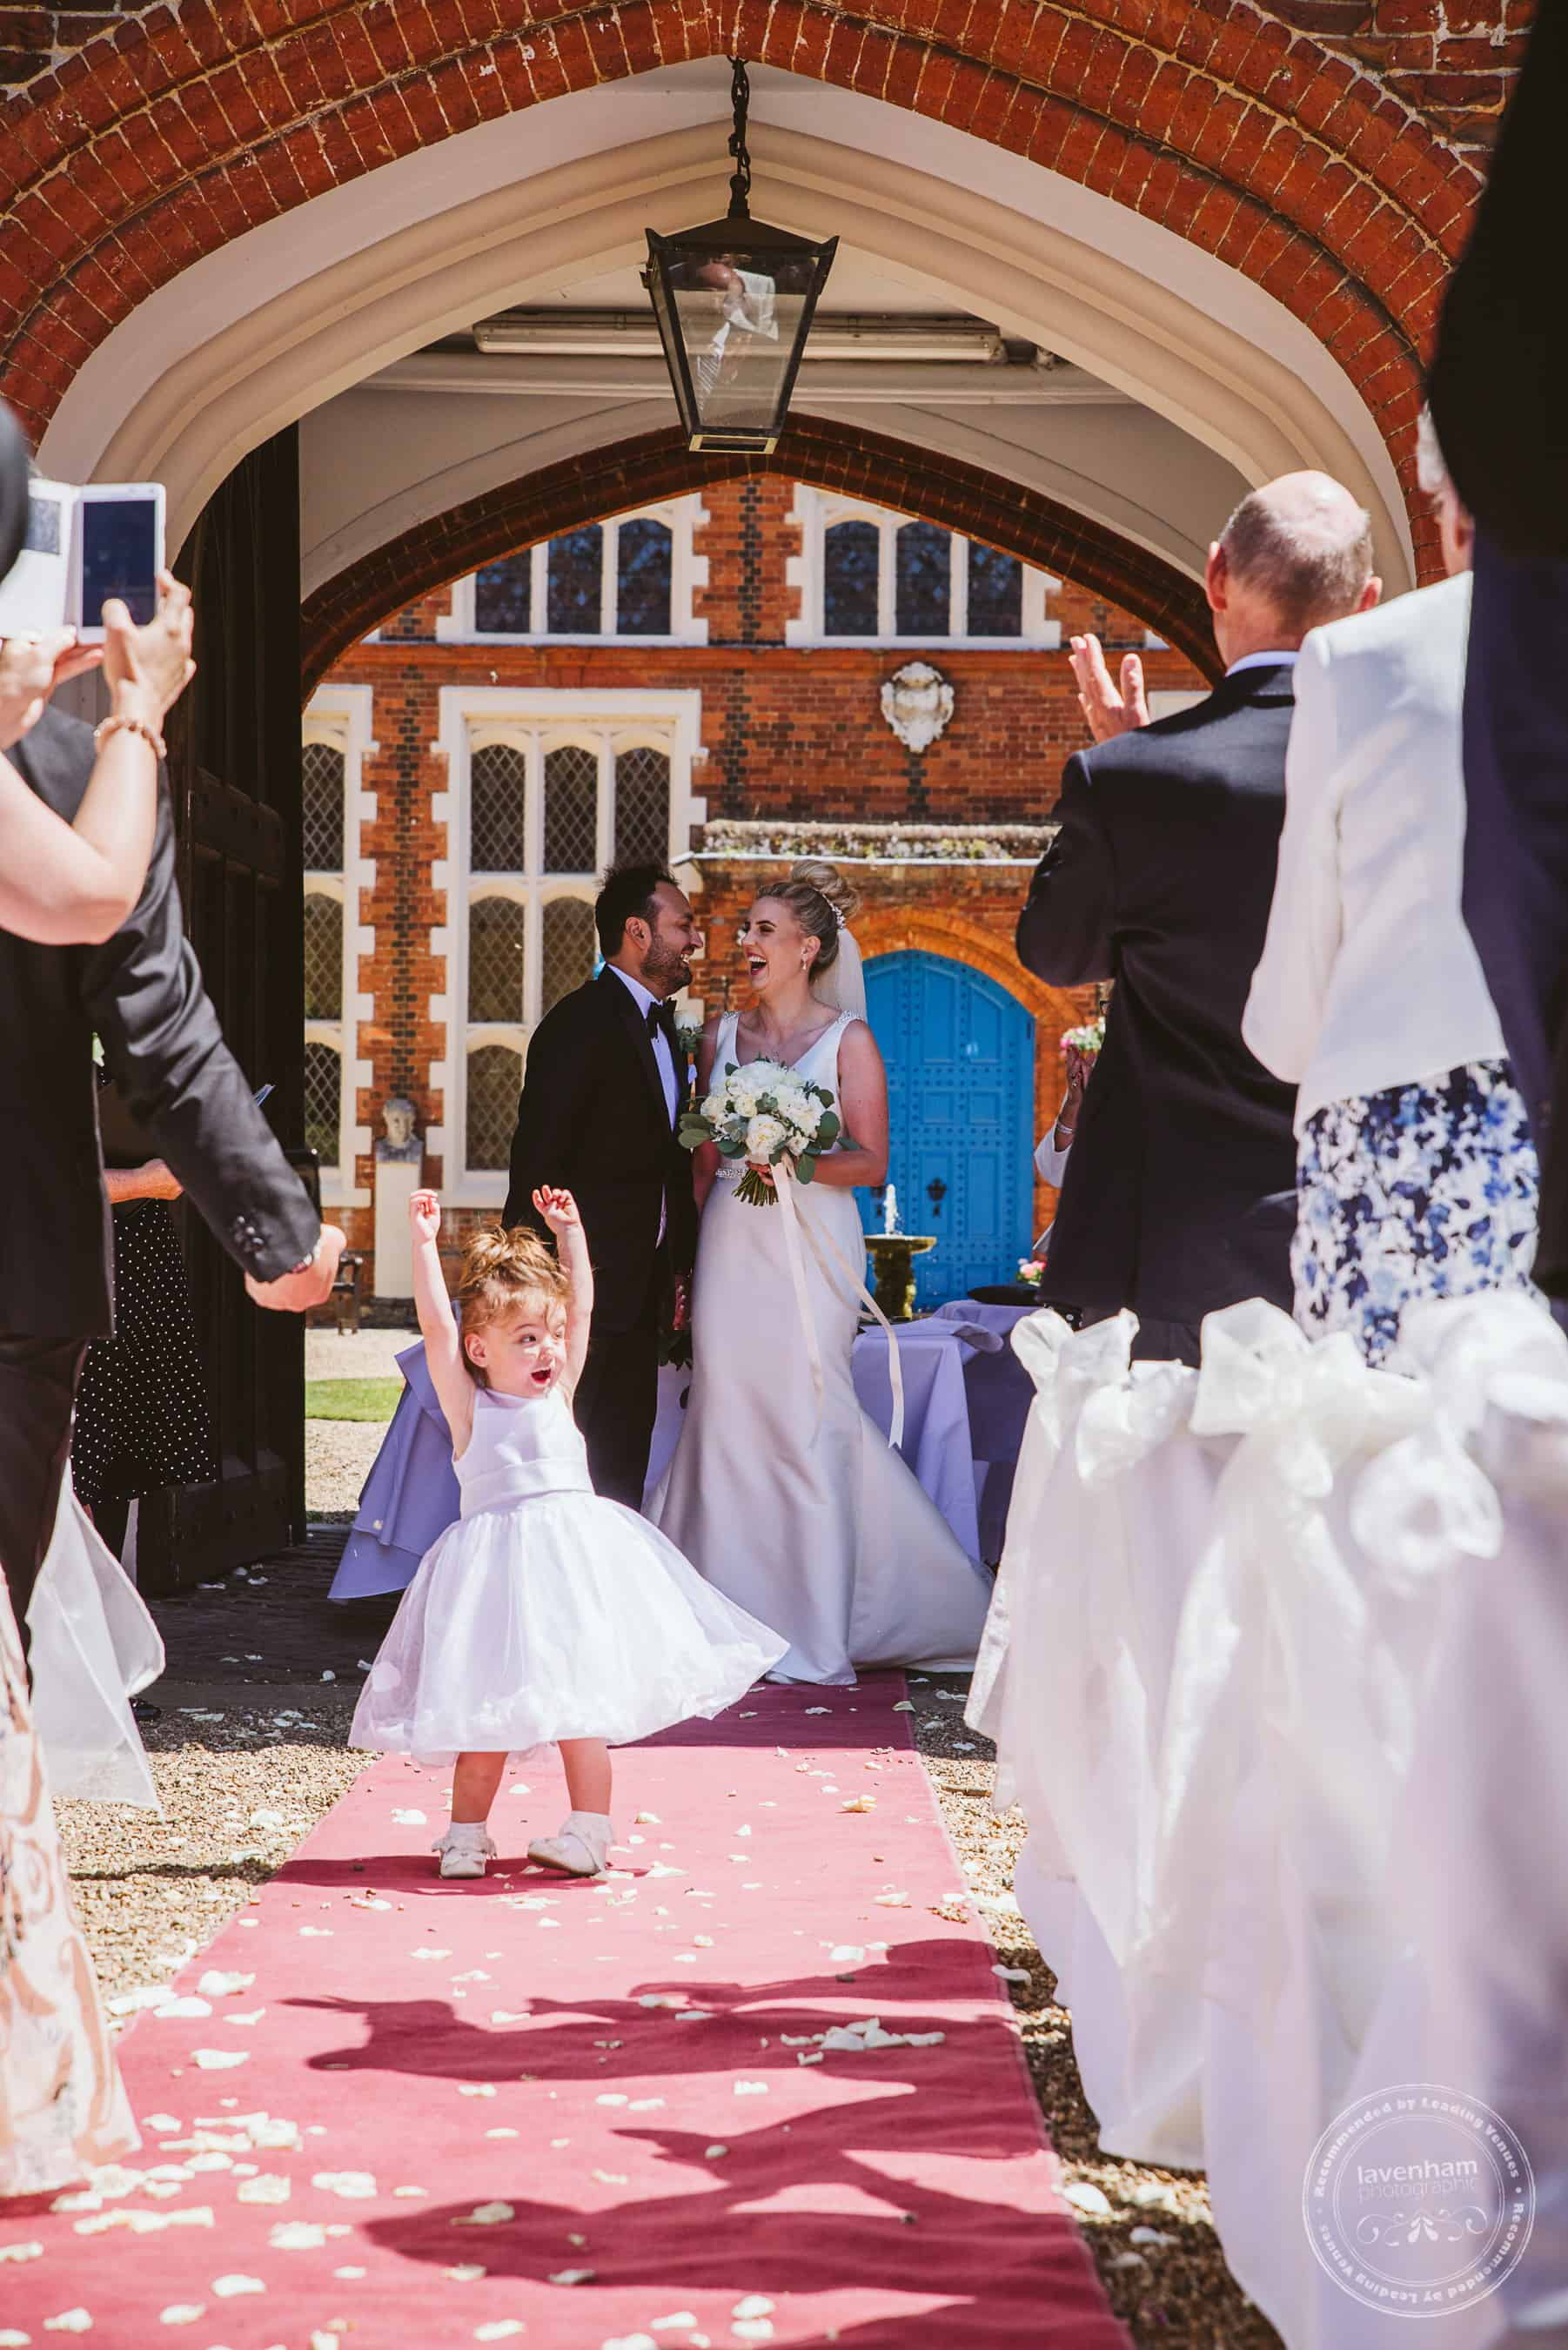 220618 Gosfield Hall Wedding Photography Lavenham Photographic 0087